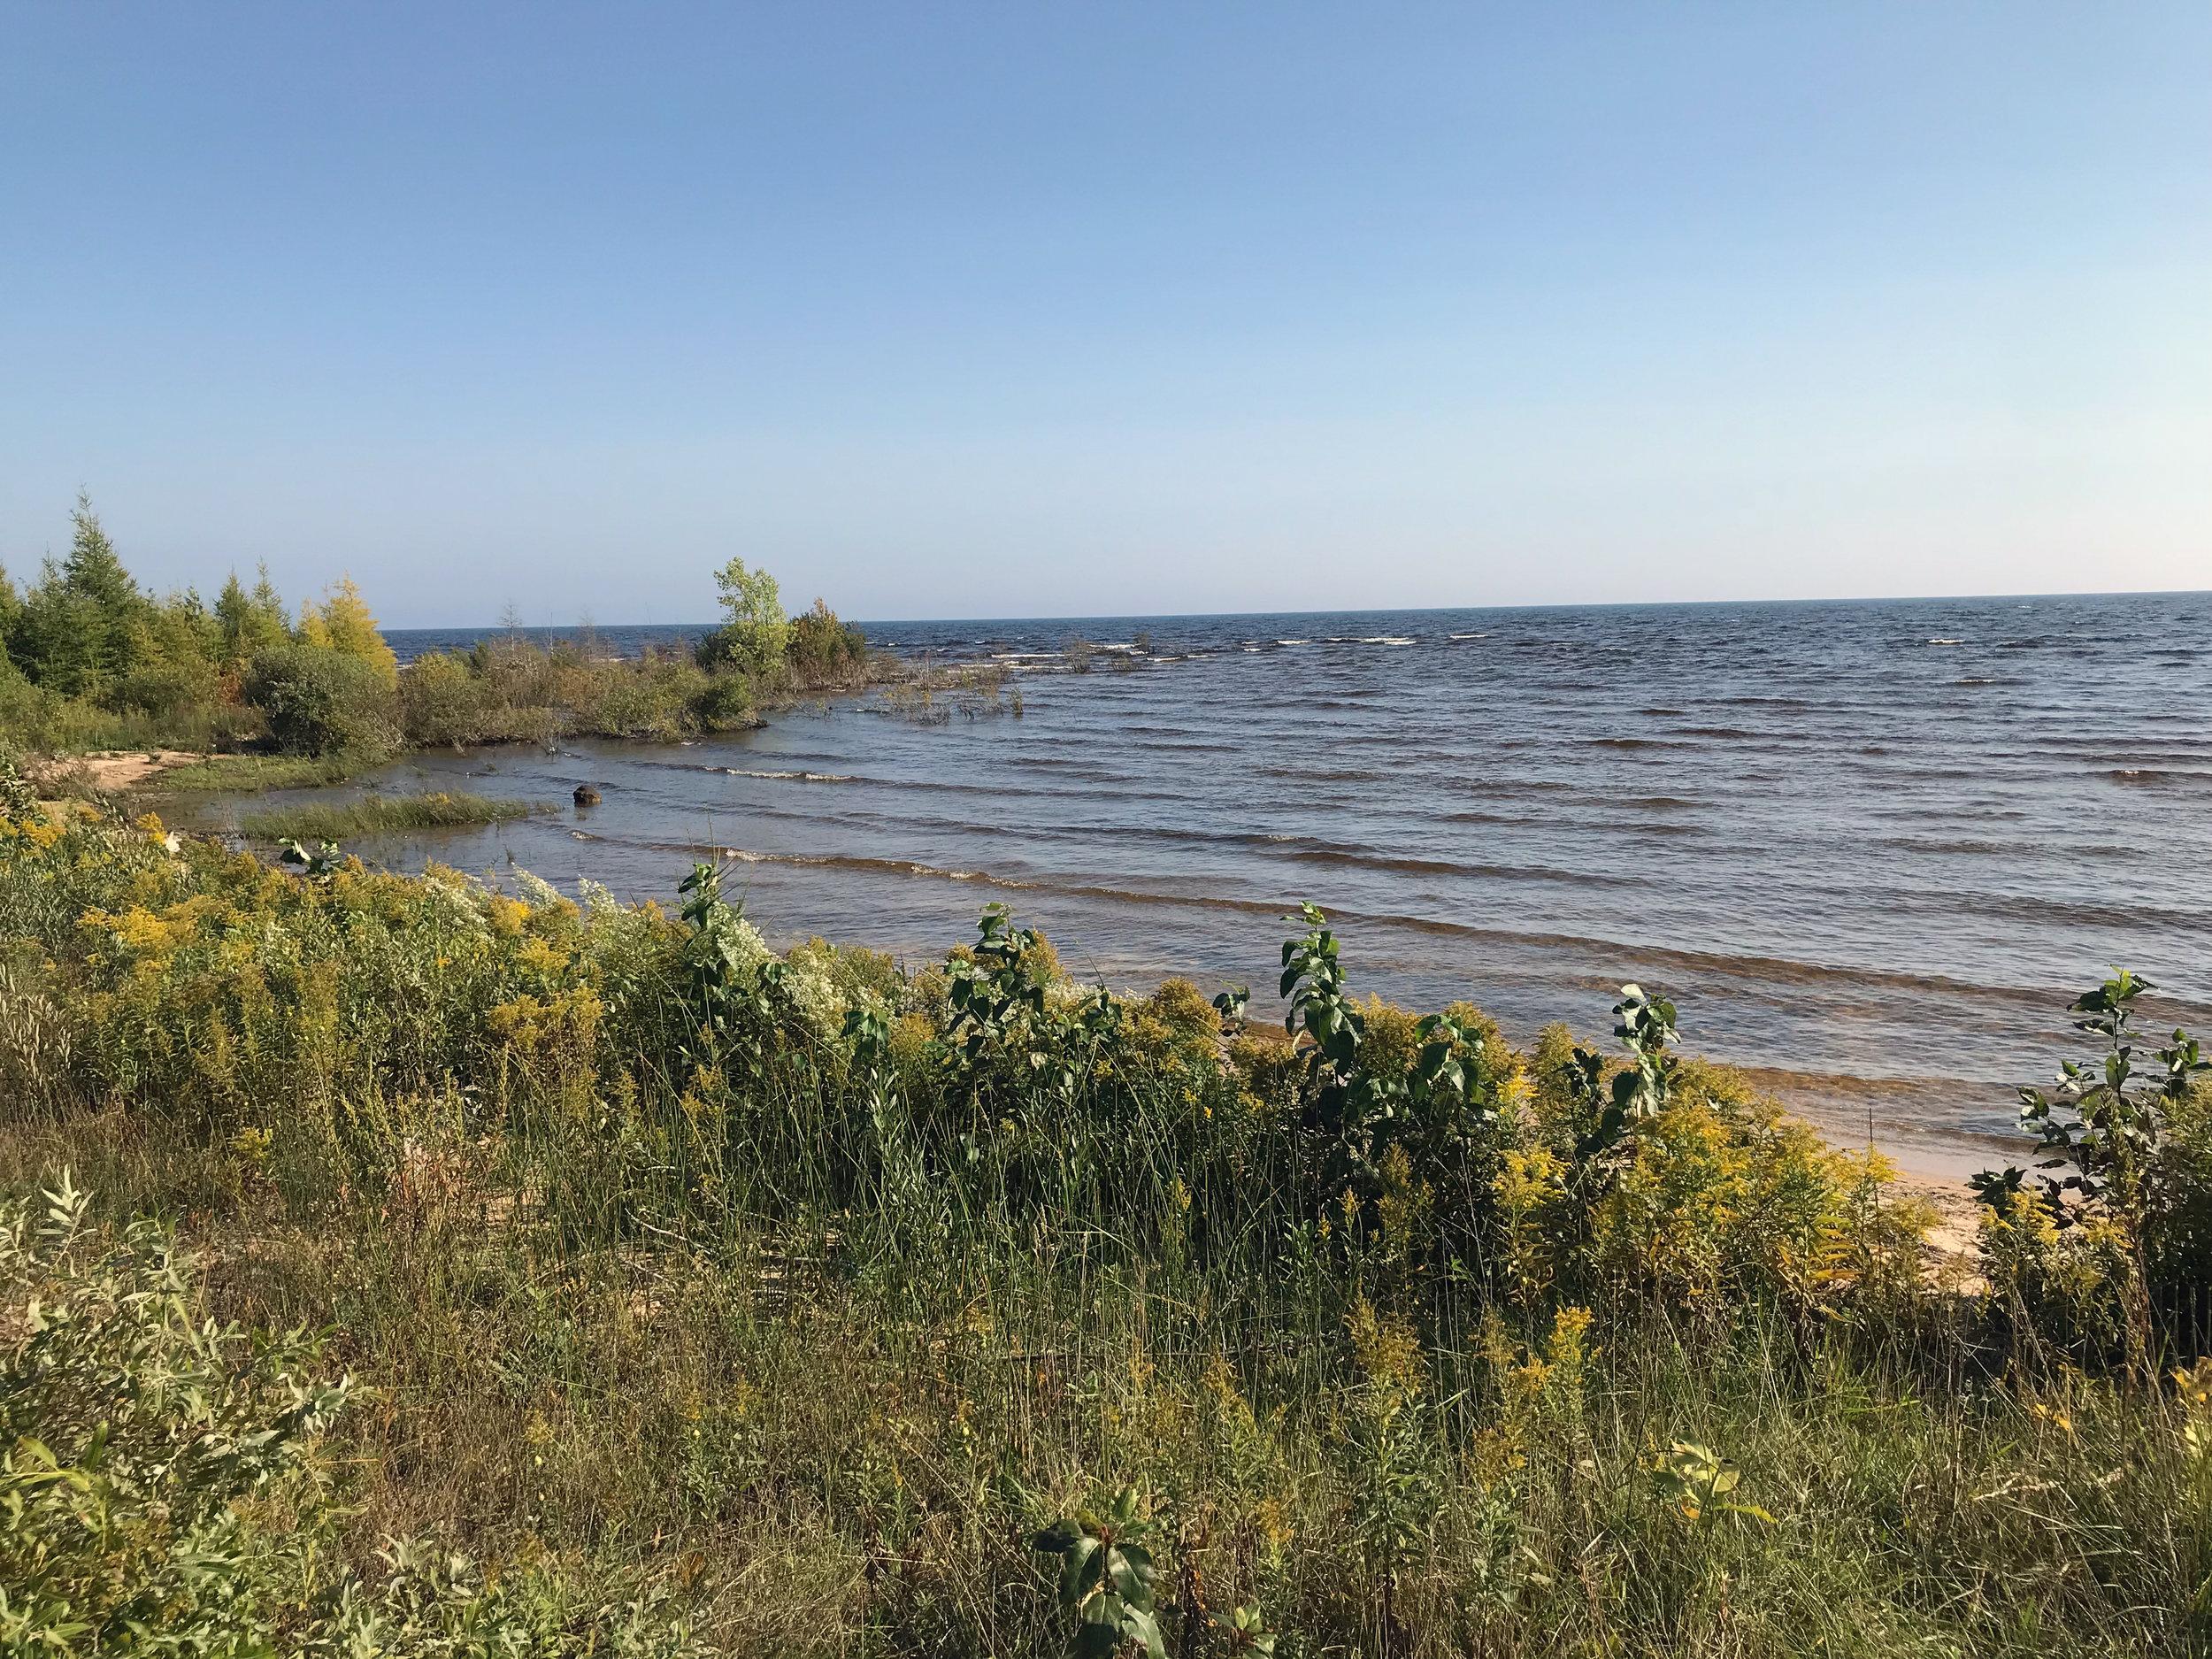 Upper Peninsula Lake Michigan Shoreline in Early Autumn